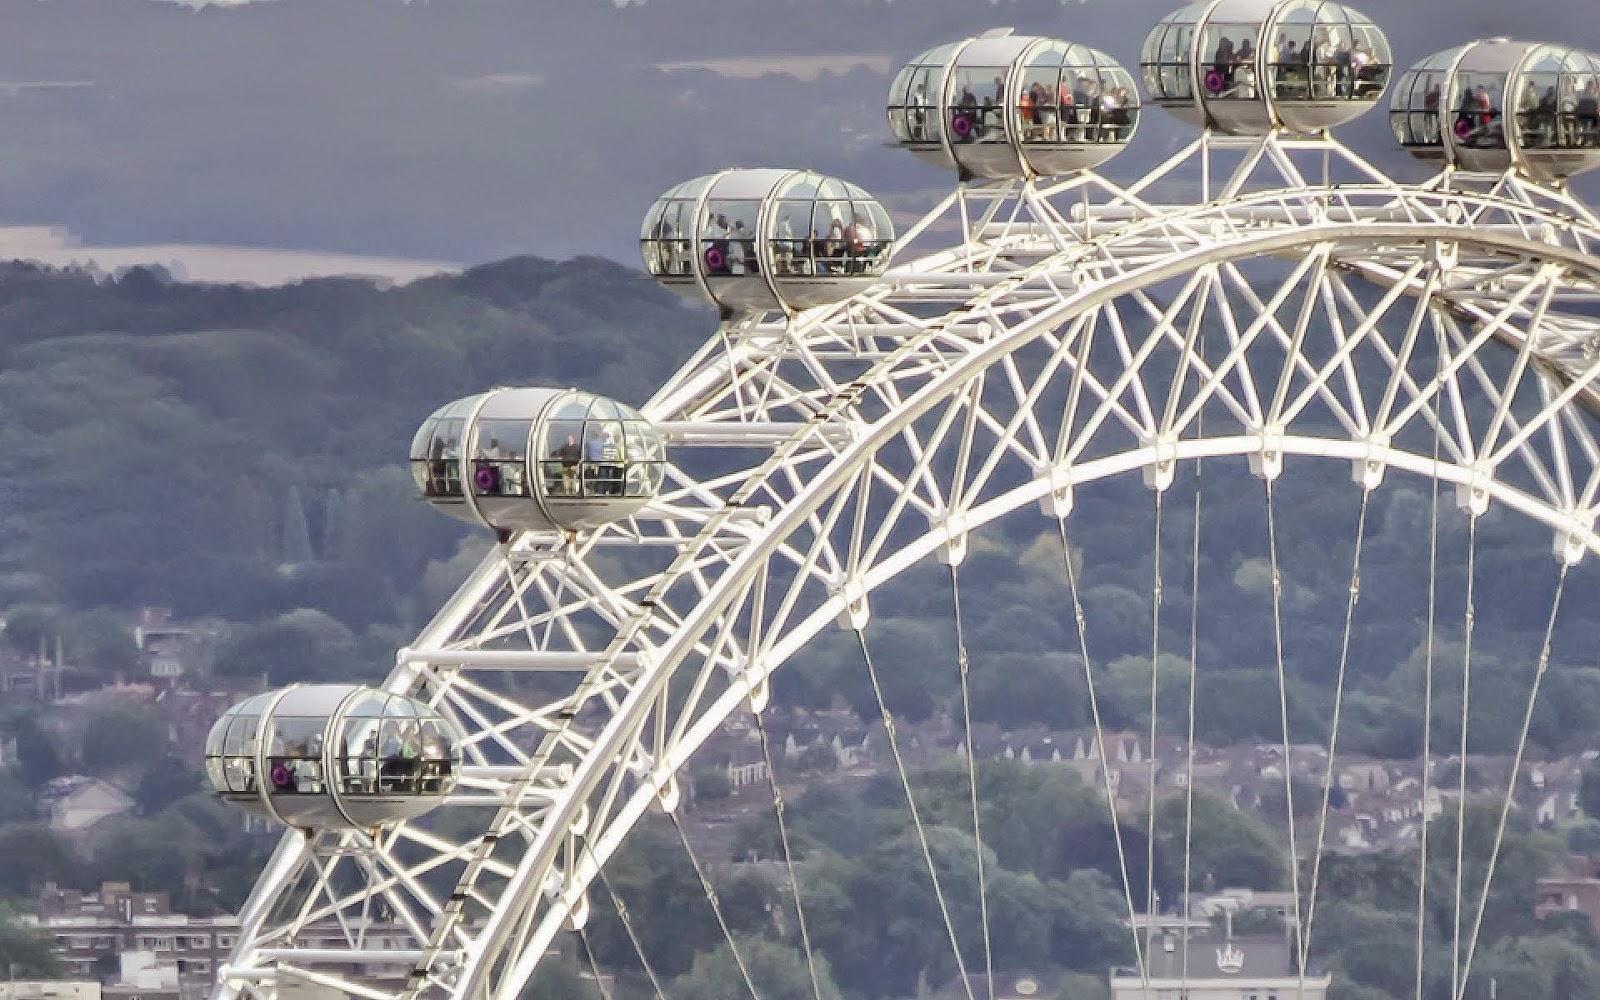 london eye objek wisata di untuk melihat kota dari atas